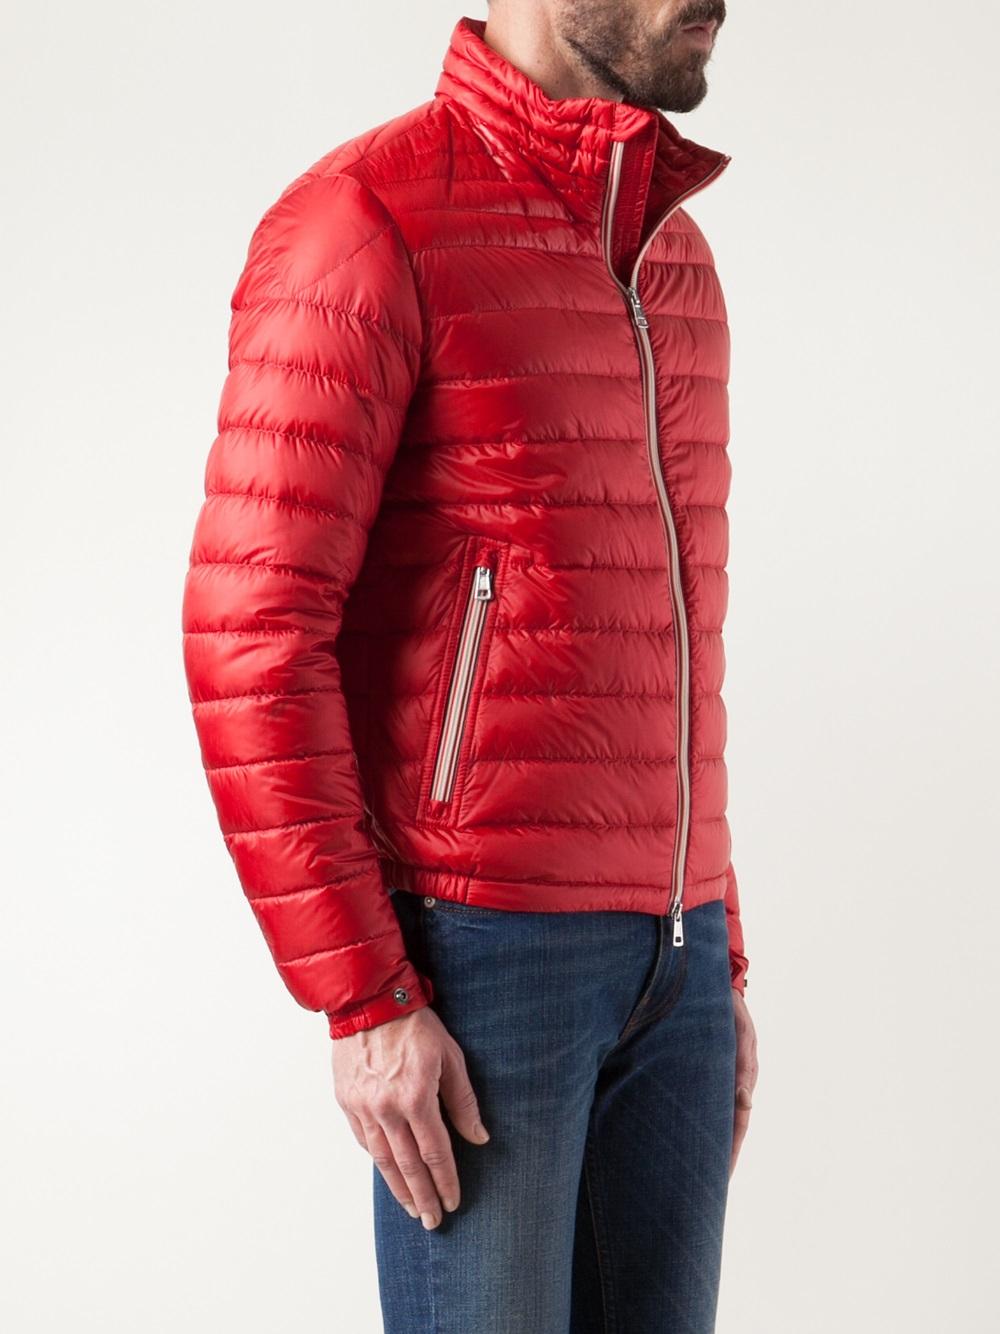 Moncler Padded Jacket in Red for Men